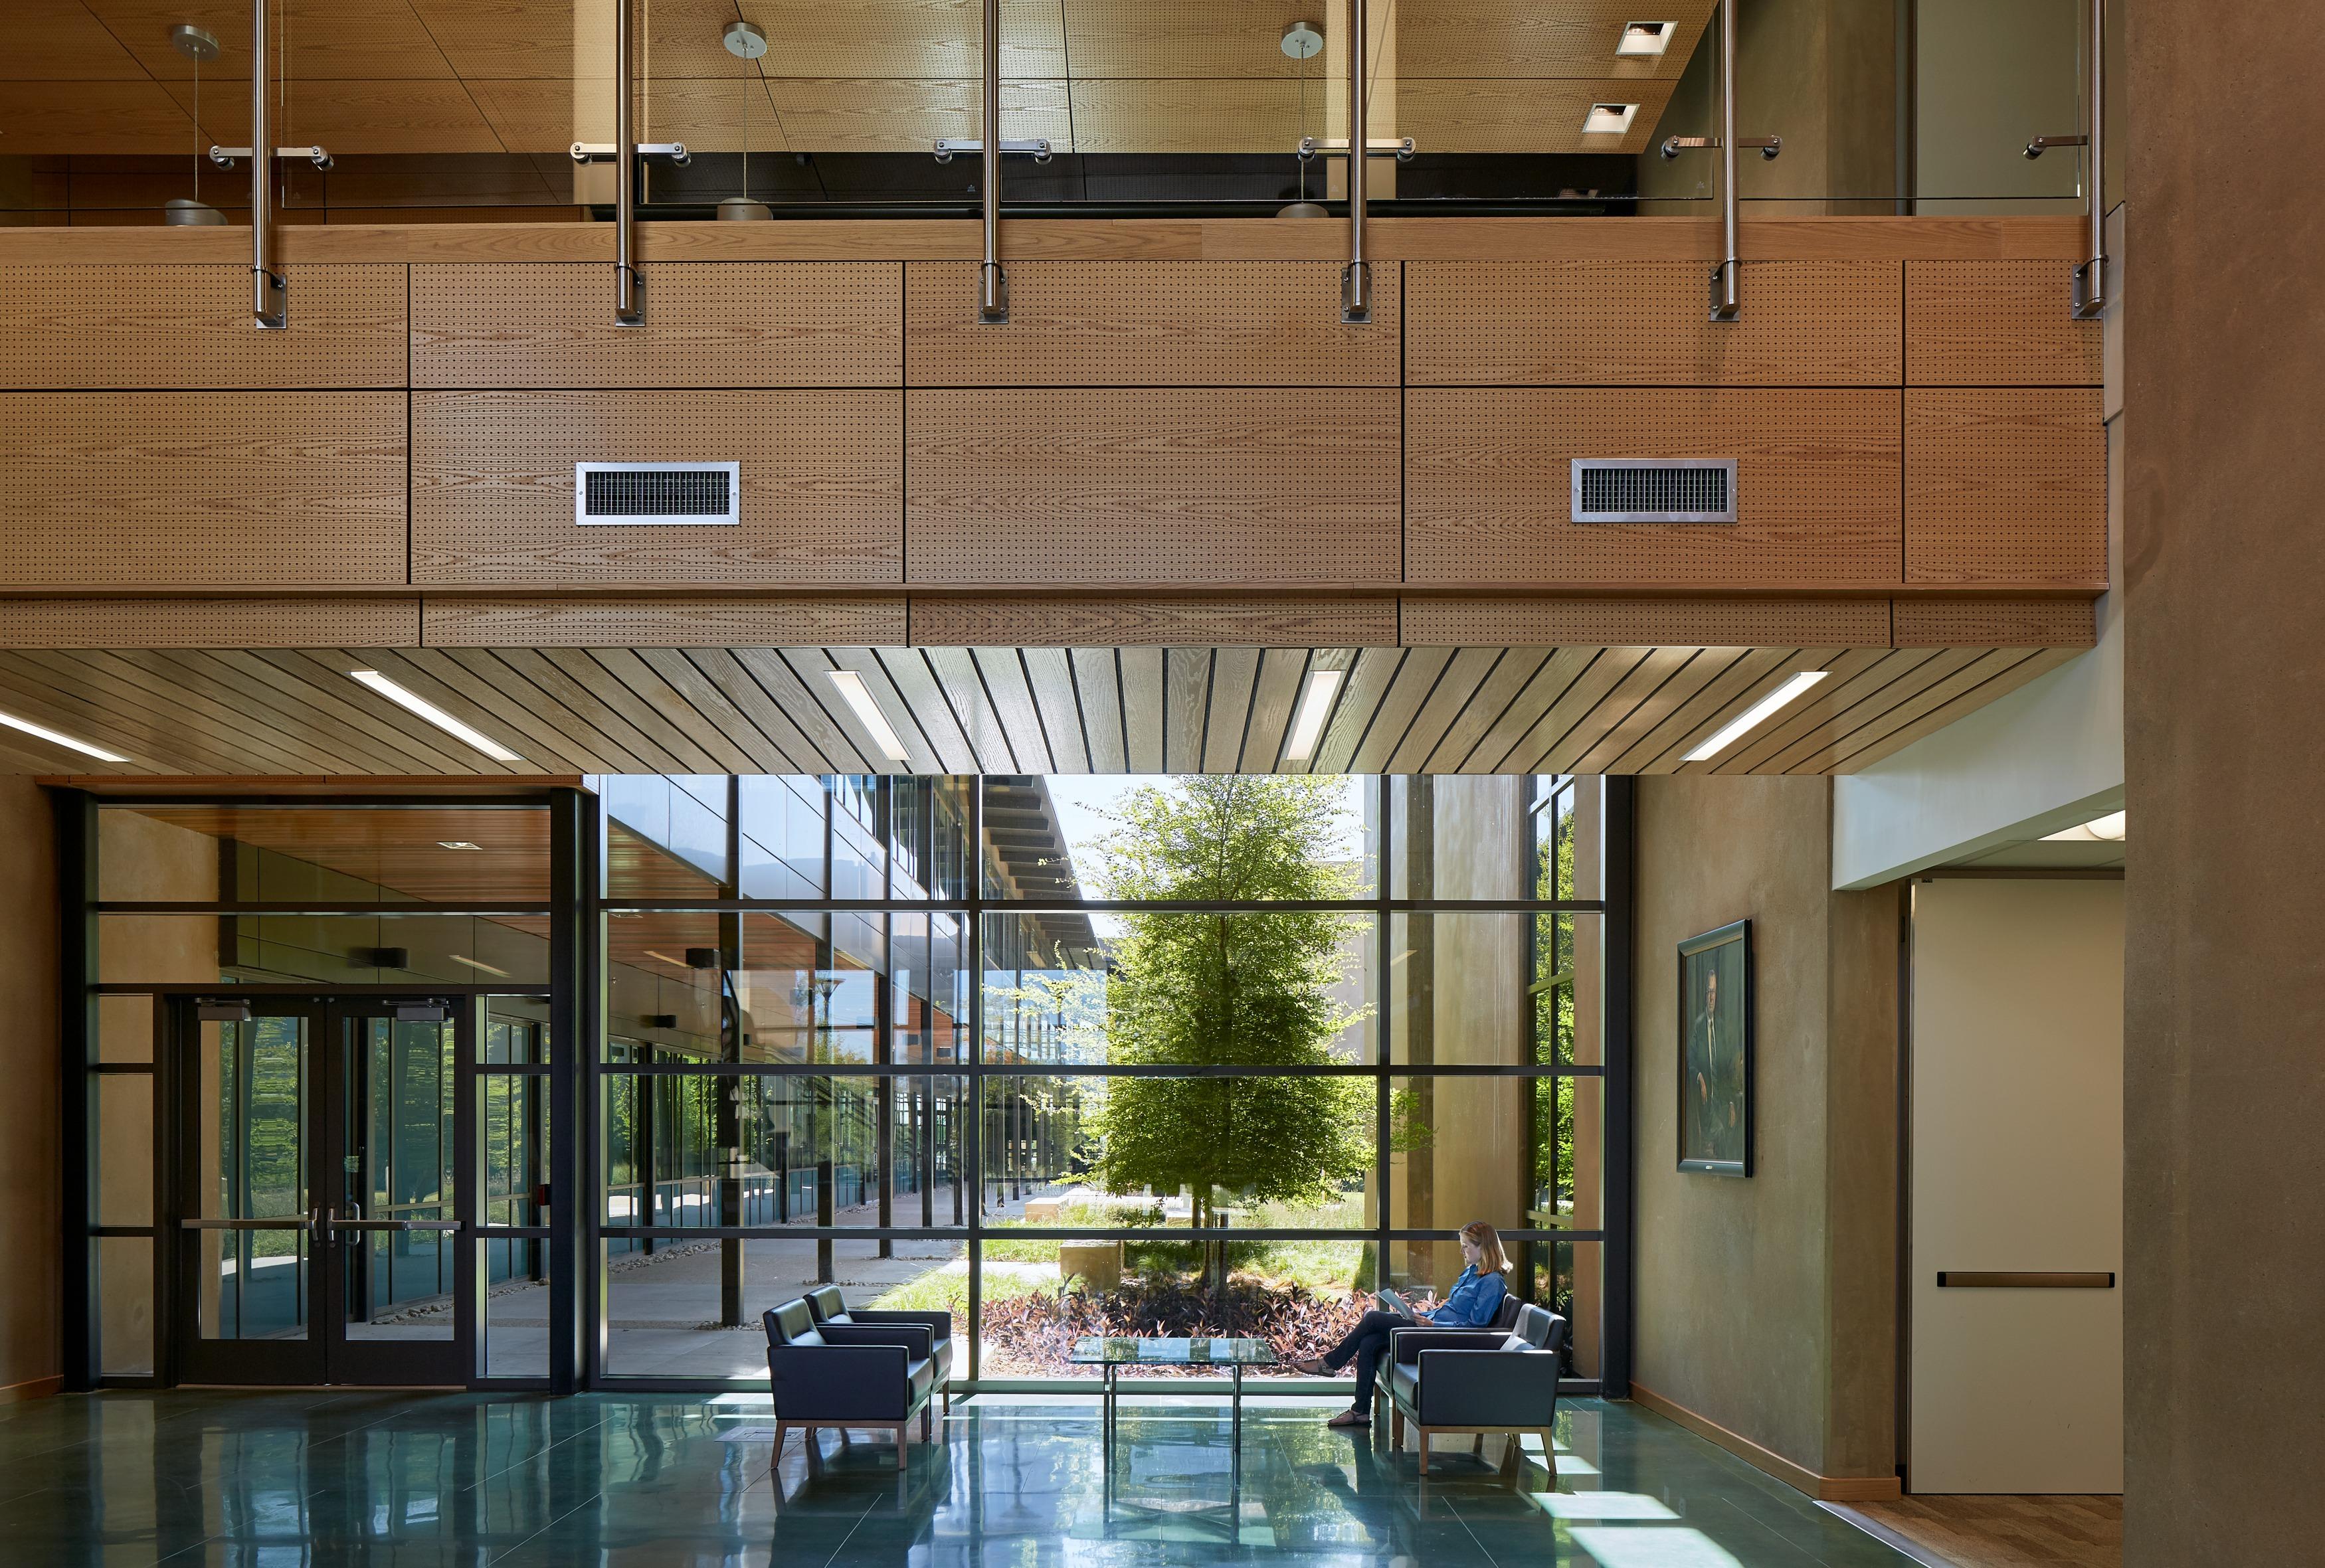 Texas Biomedical Research Institute Facility Lake Flato